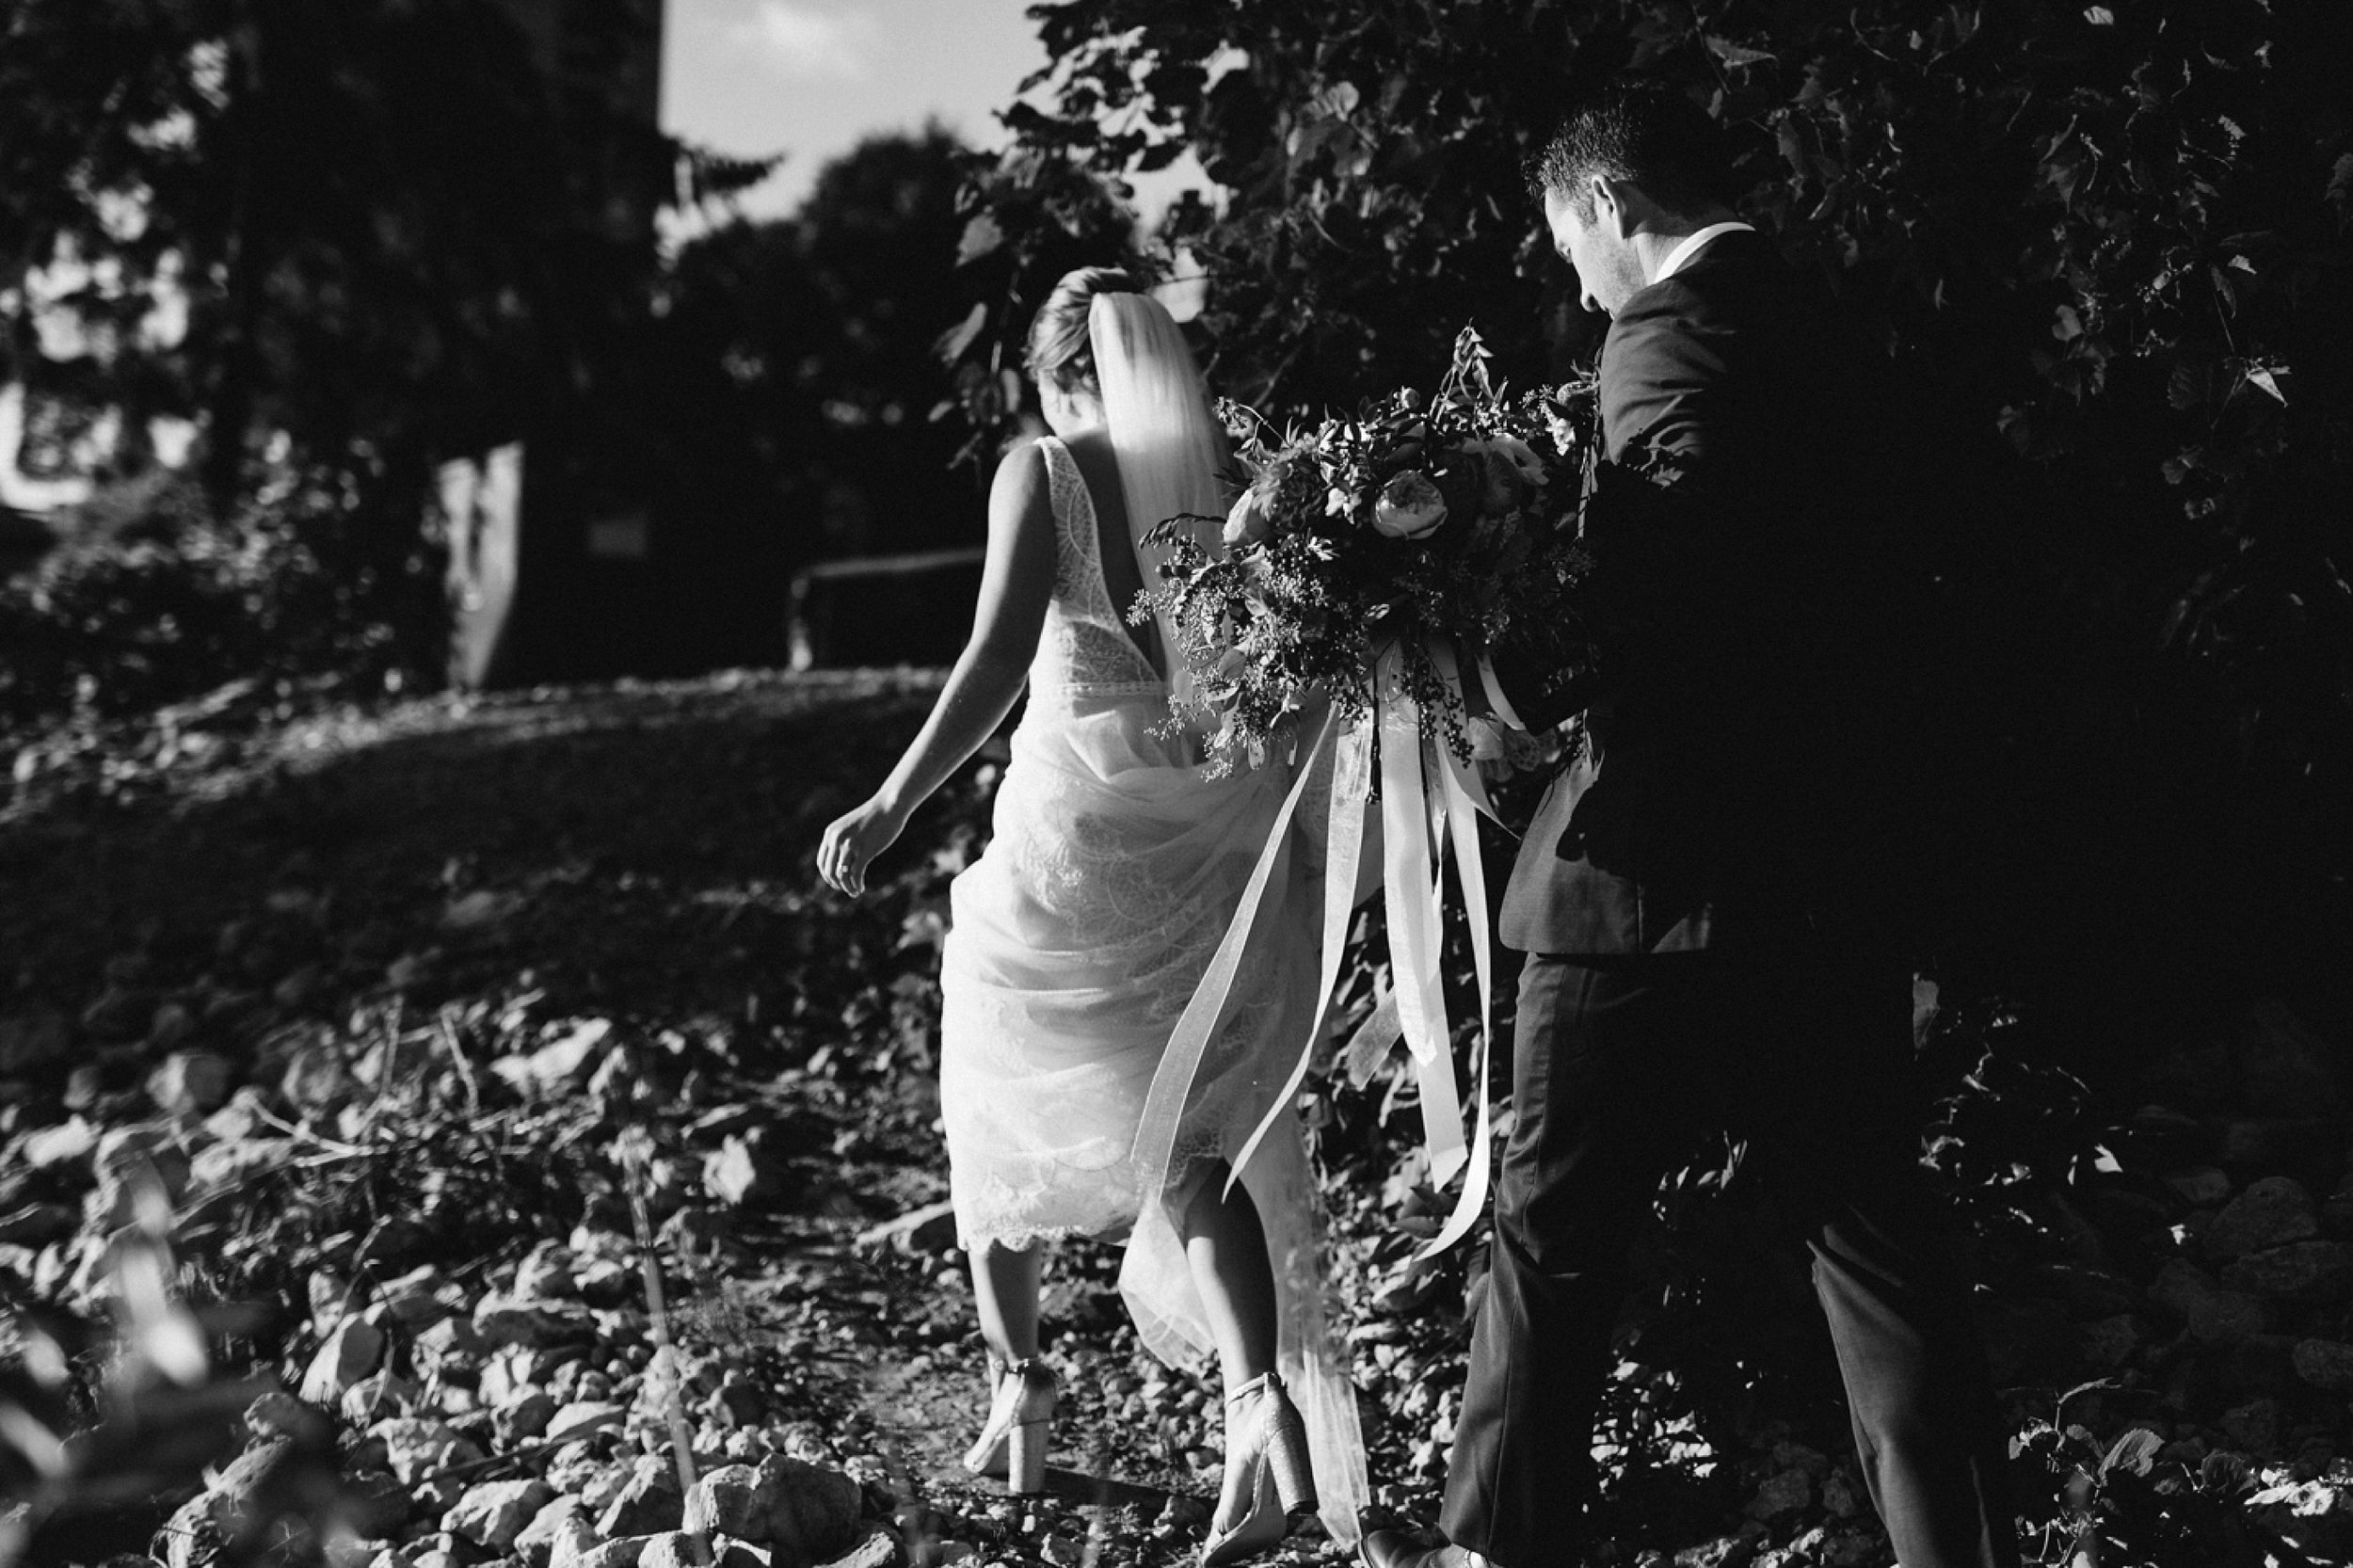 Nicollet-Island-Pavilion-Minneapolis-September-Coral-Navy-Wedding-74.jpg